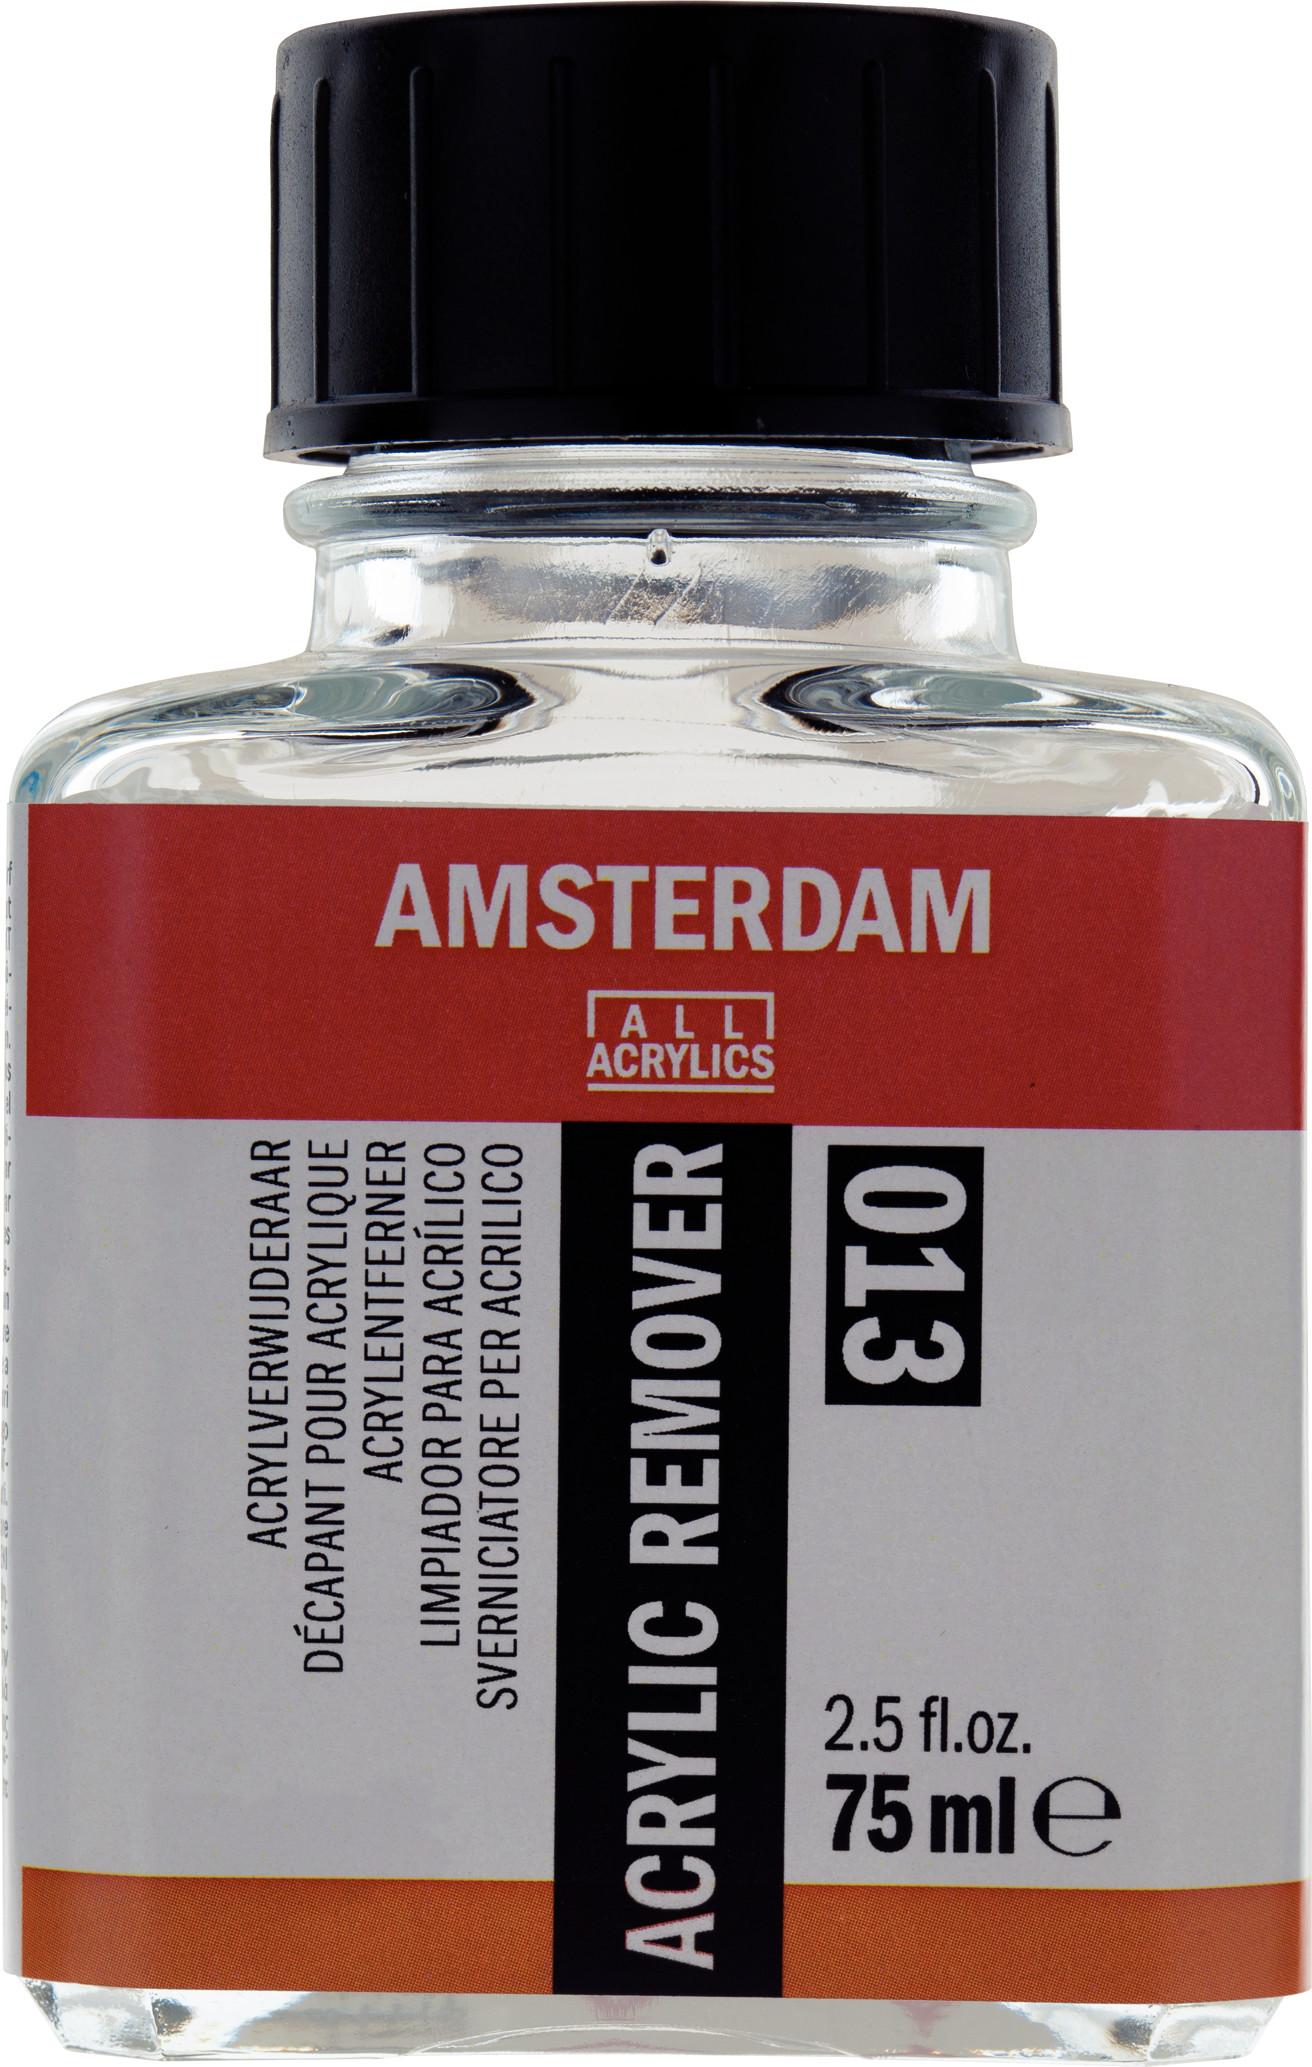 Amsterdam Acrylic Remover Bottle 75 ml